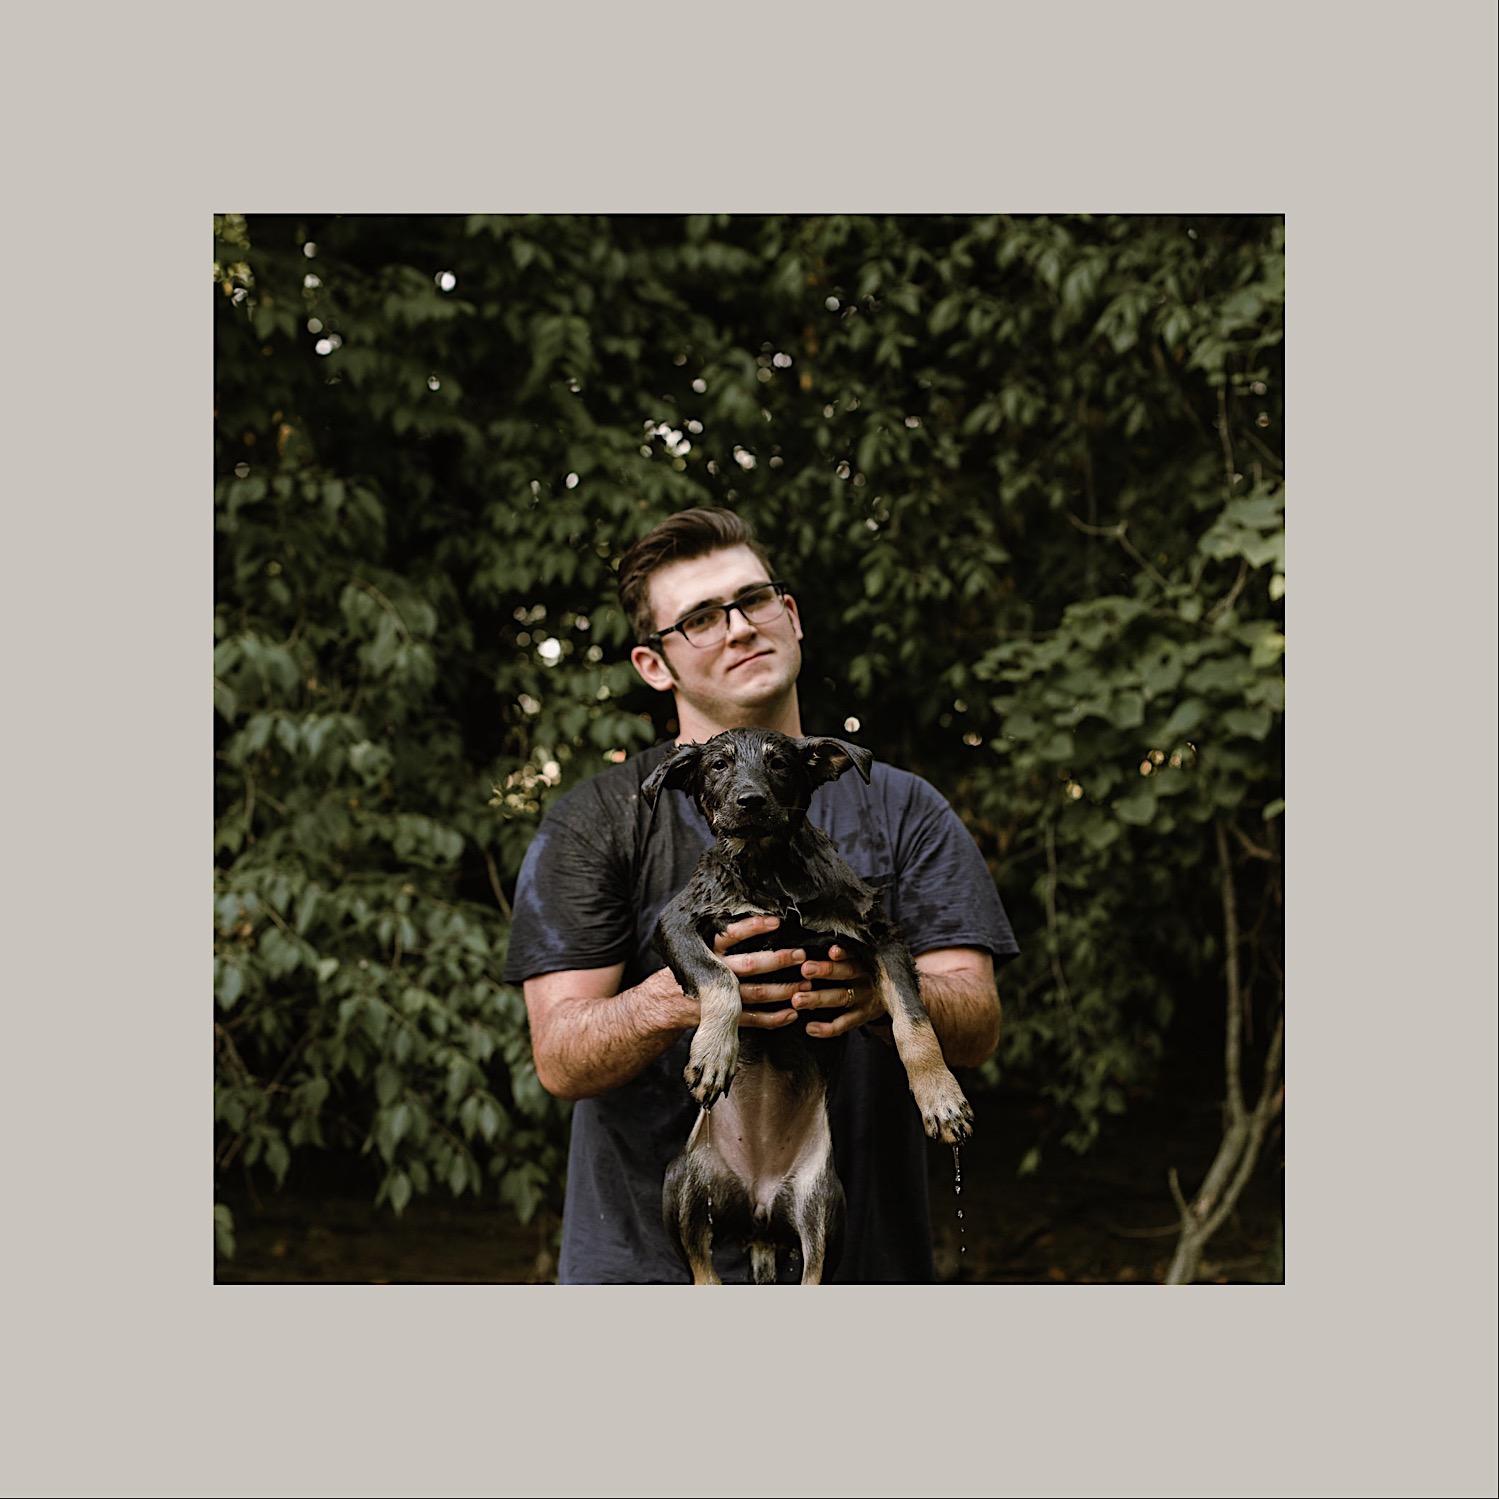 5_Pet_Photography_Photographer_dog_Indianapolis.jpg